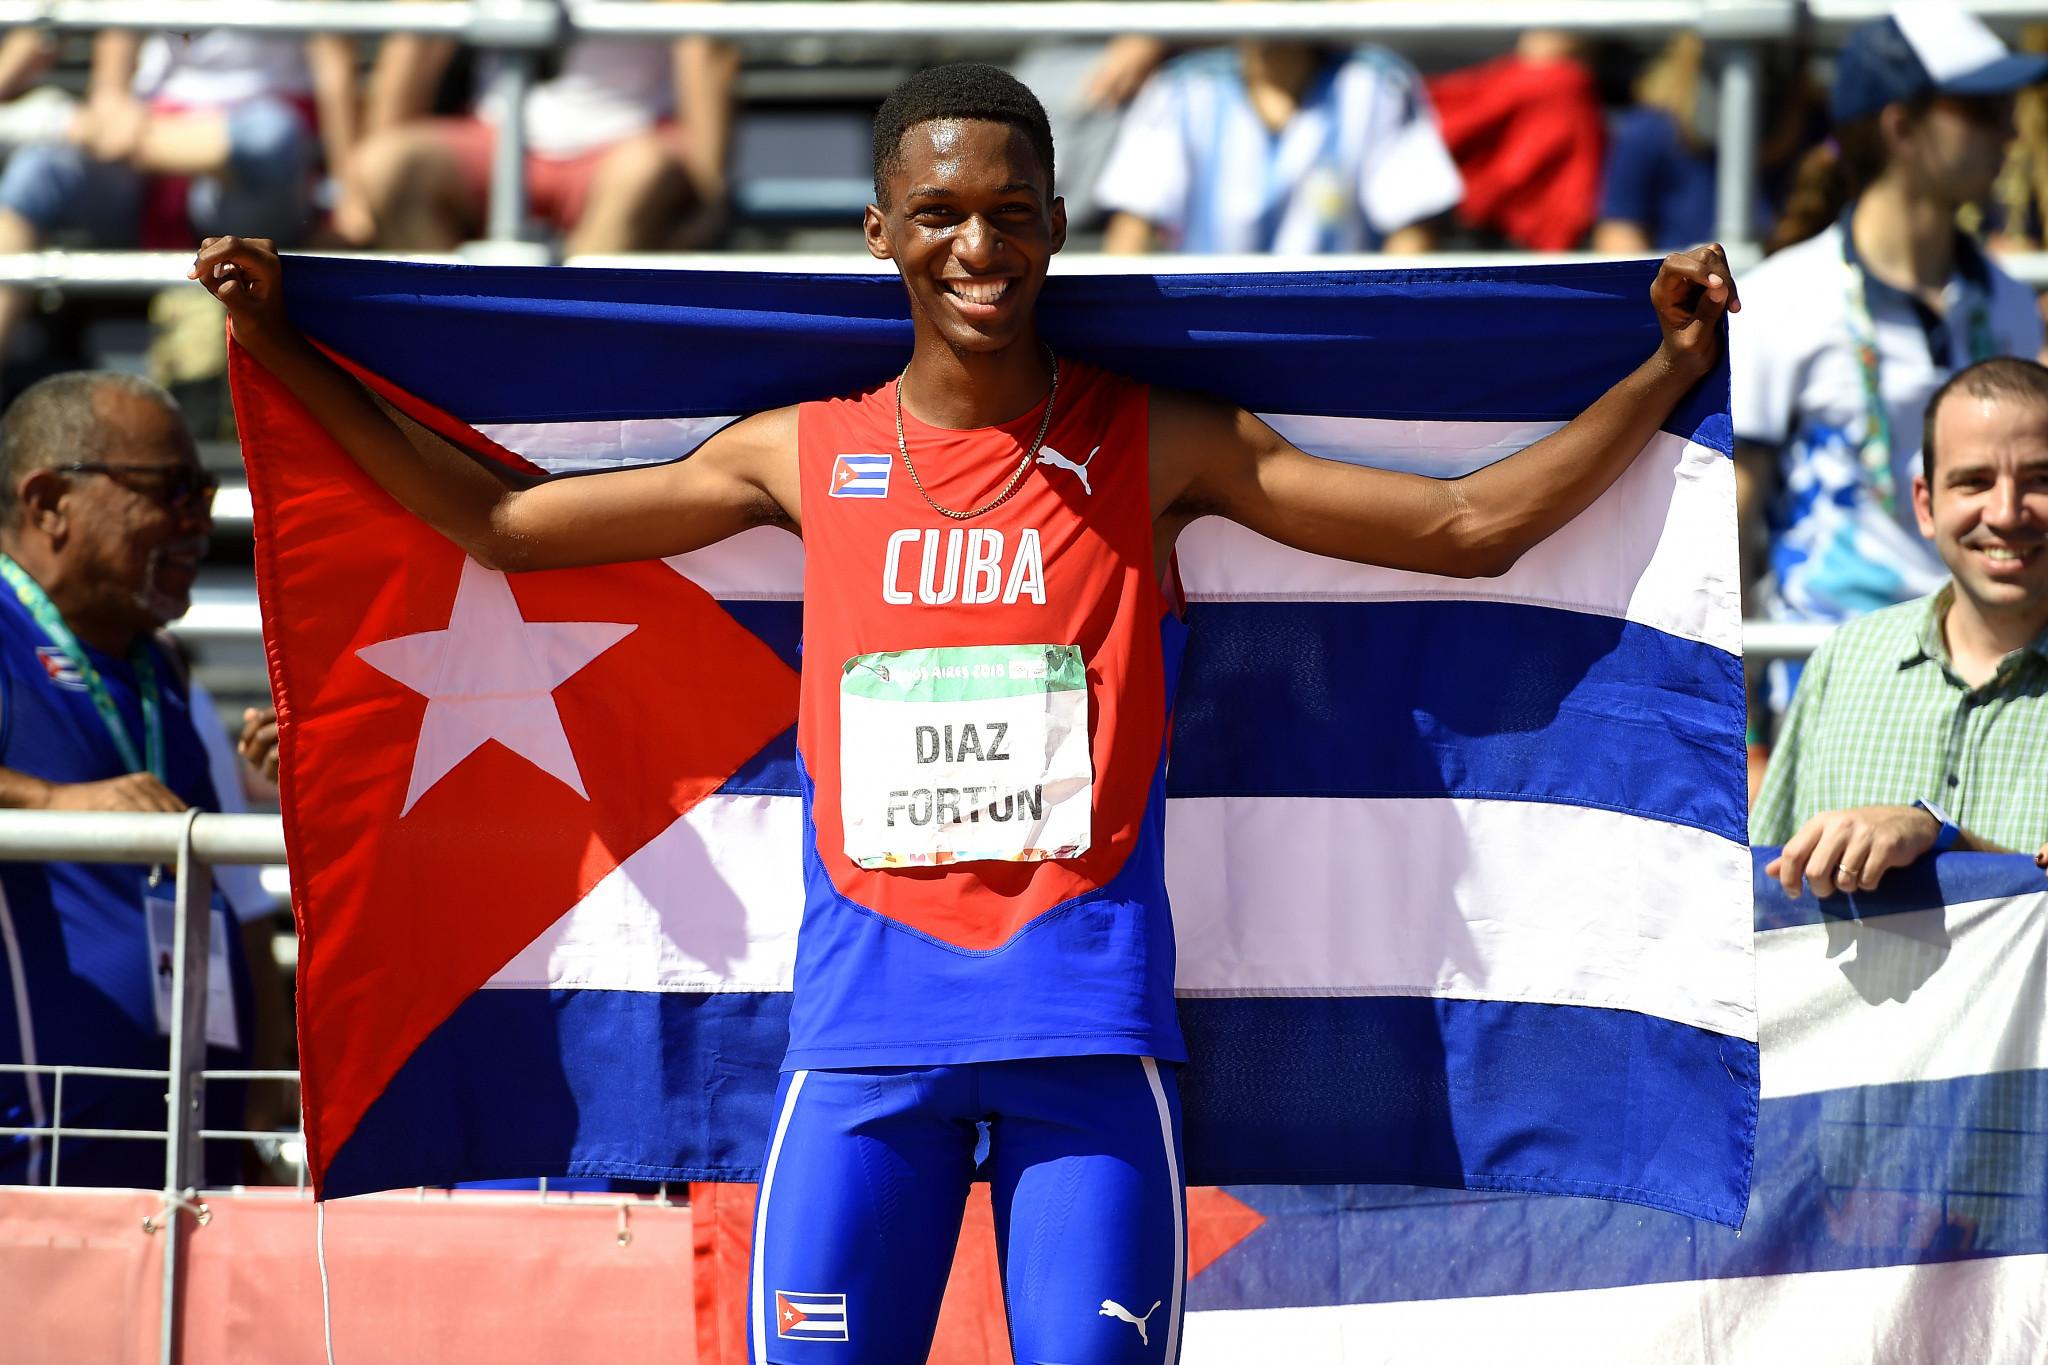 Cuba's  Jordan Diaz Fortun was the clear winner of the men's triple jump ©Getty Images